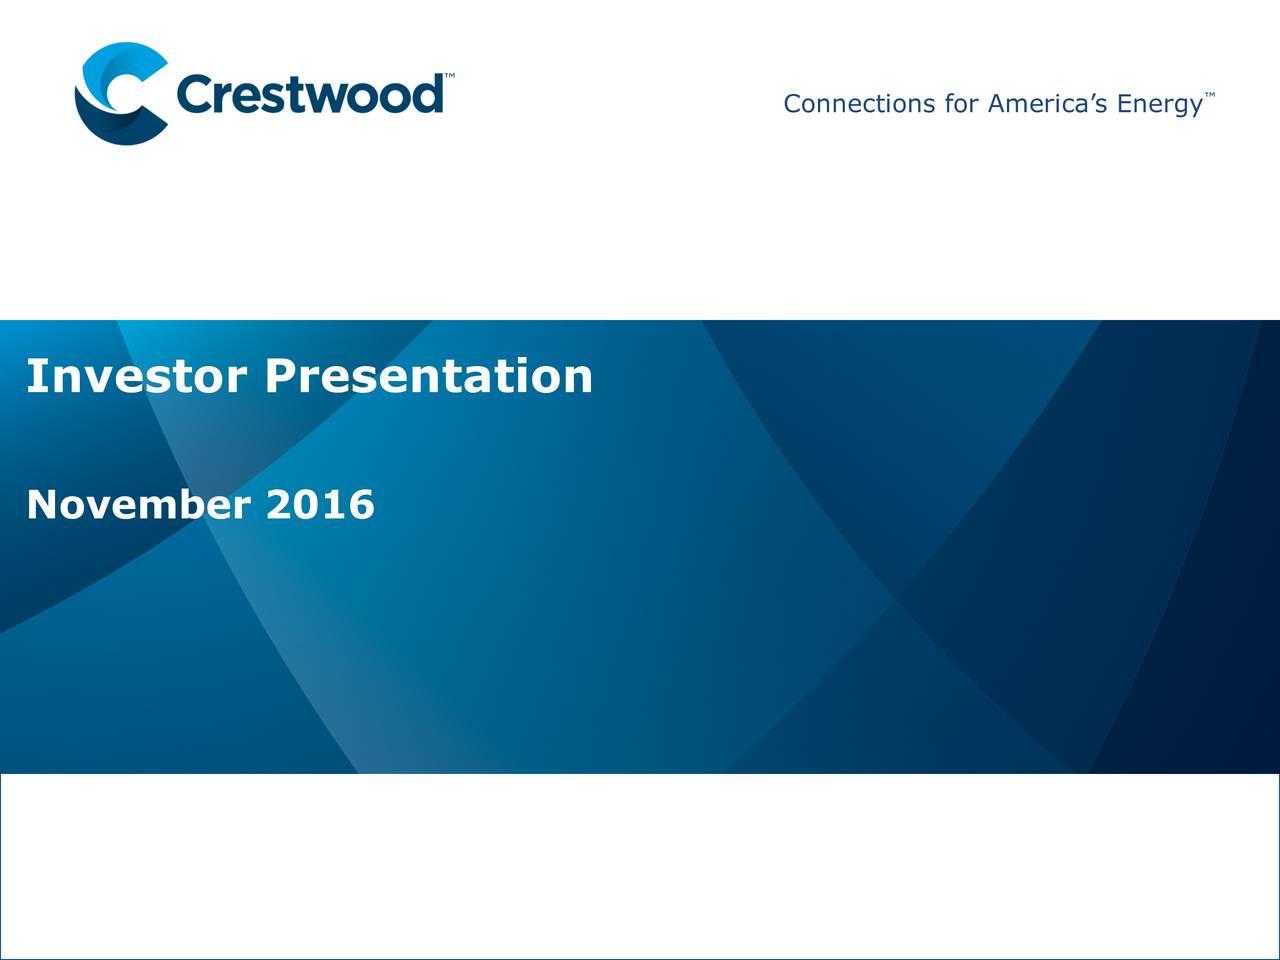 Connetons orAmeriasEnegy Investor Presentation Prreesseen nttaattioonn TTi itlee November 2016ation SSubbtttle 11/16/16 CretwoodMidsream artnrsLP CrstwoodEqutyParnersLP